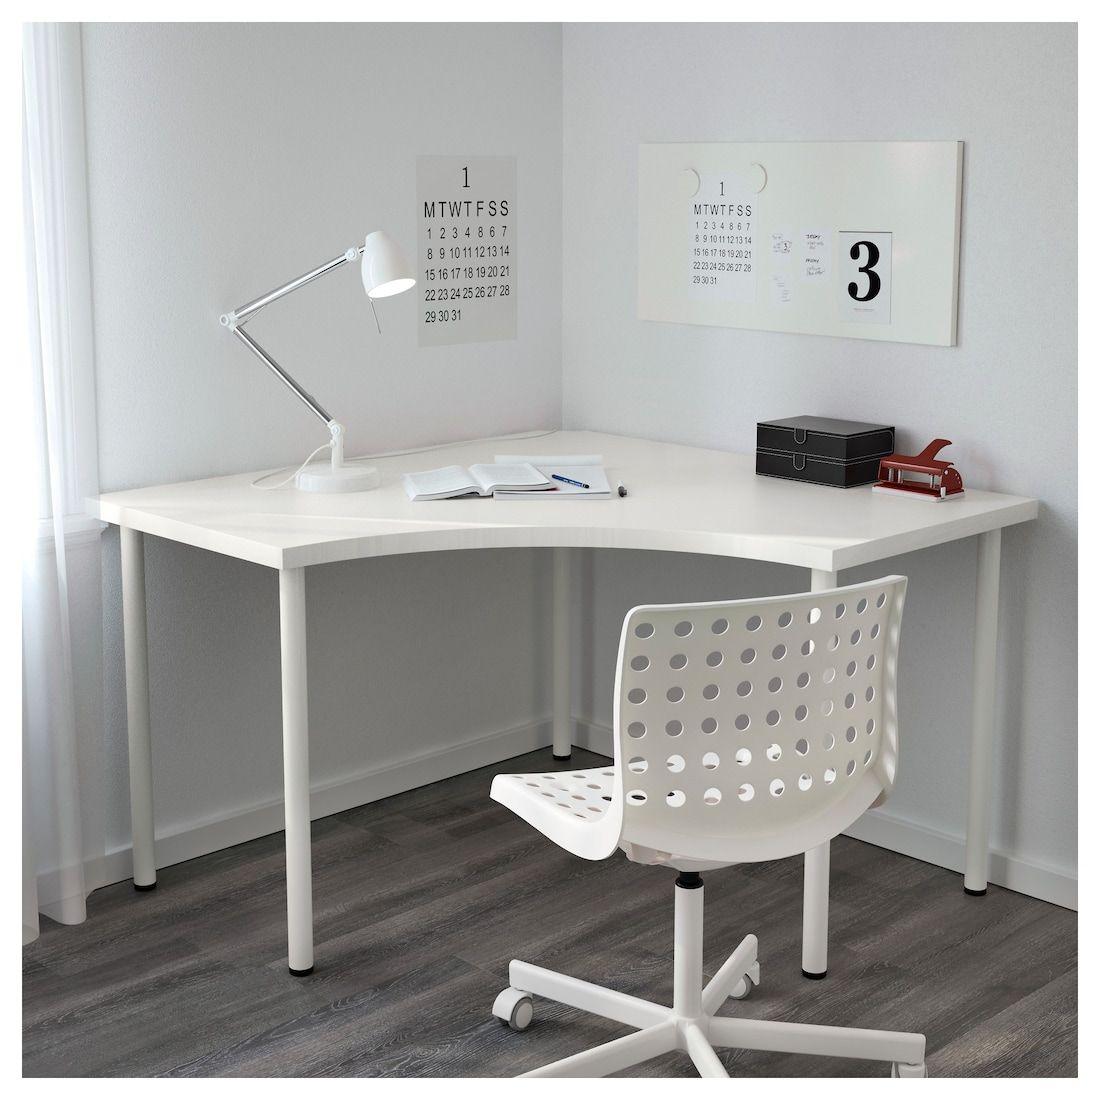 Linnmon Adils Corner Table White 47 1 4x47 1 4 Ikea Corner Table Ikea Ikea Corner Desk Corner Table